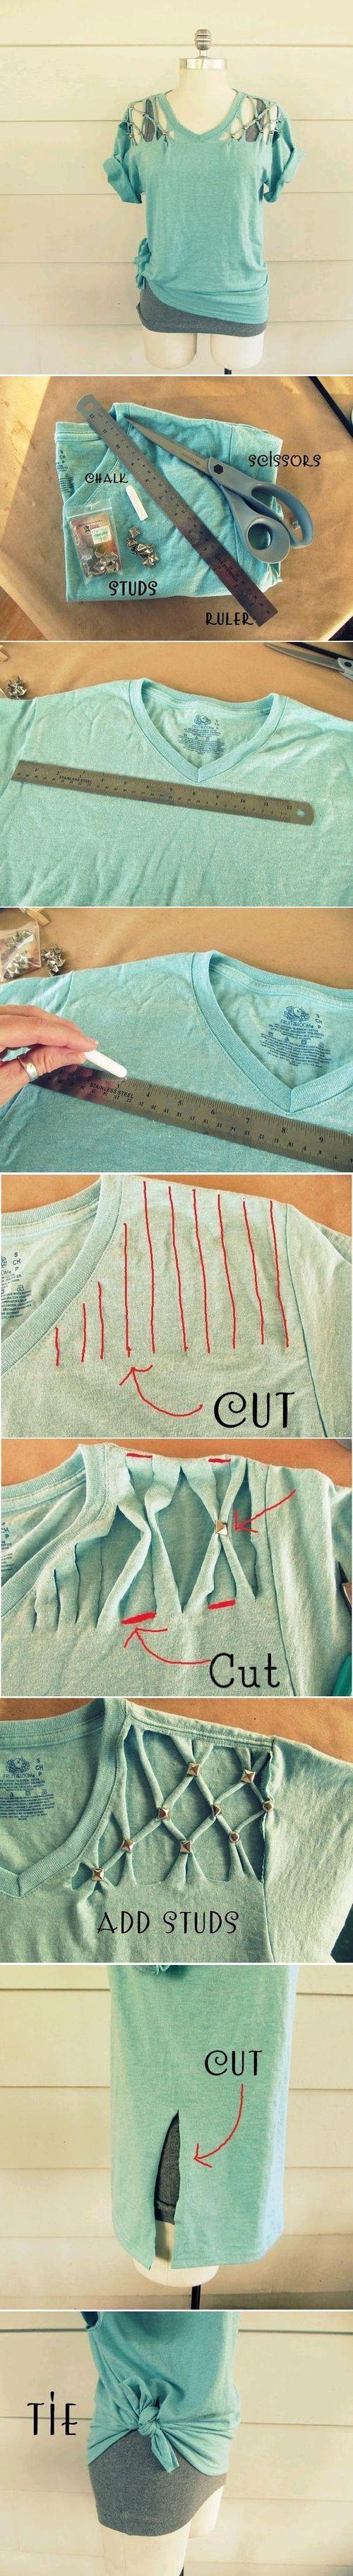 DIY Cool Studded T-Shirt DIY Projects / UsefulDIY.com on imgfave